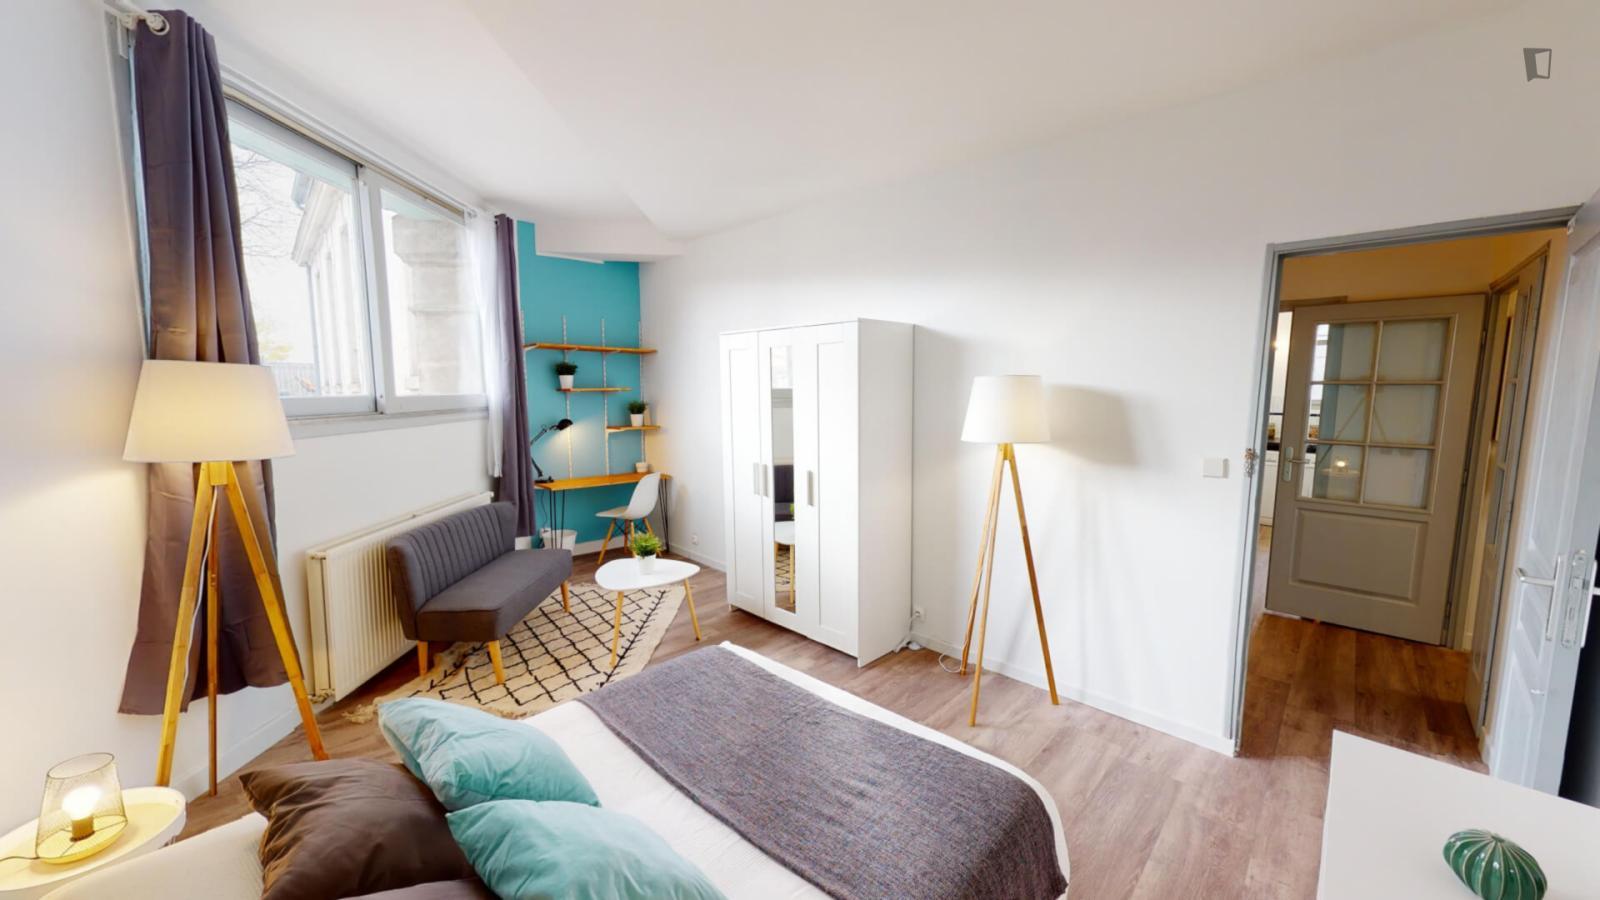 Rue des Deux-Ponts, Montpellier, FR-34 - 558 EUR/ month